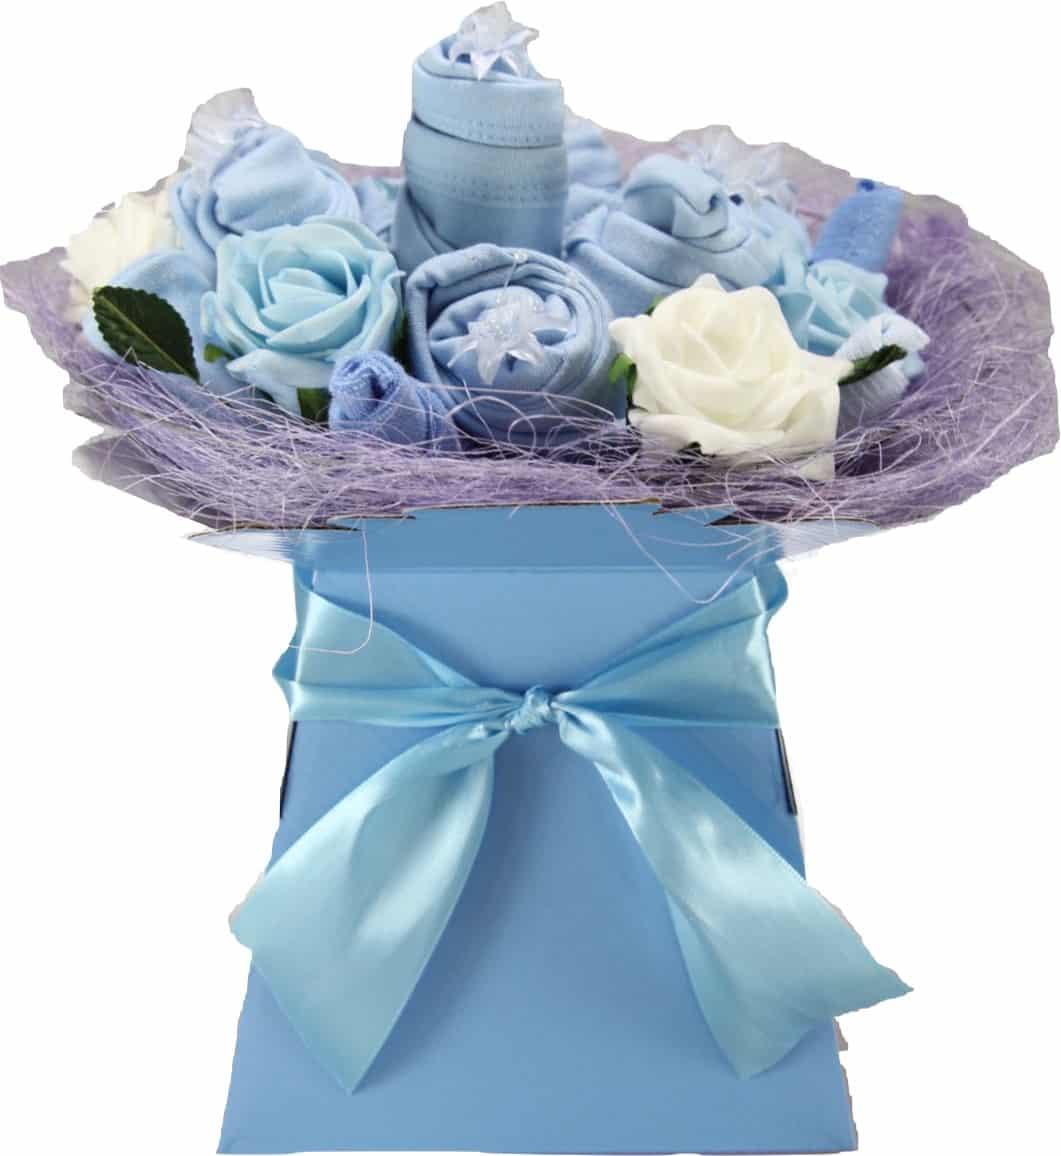 Baby Boy Ever Blossom Clothes Bouquet